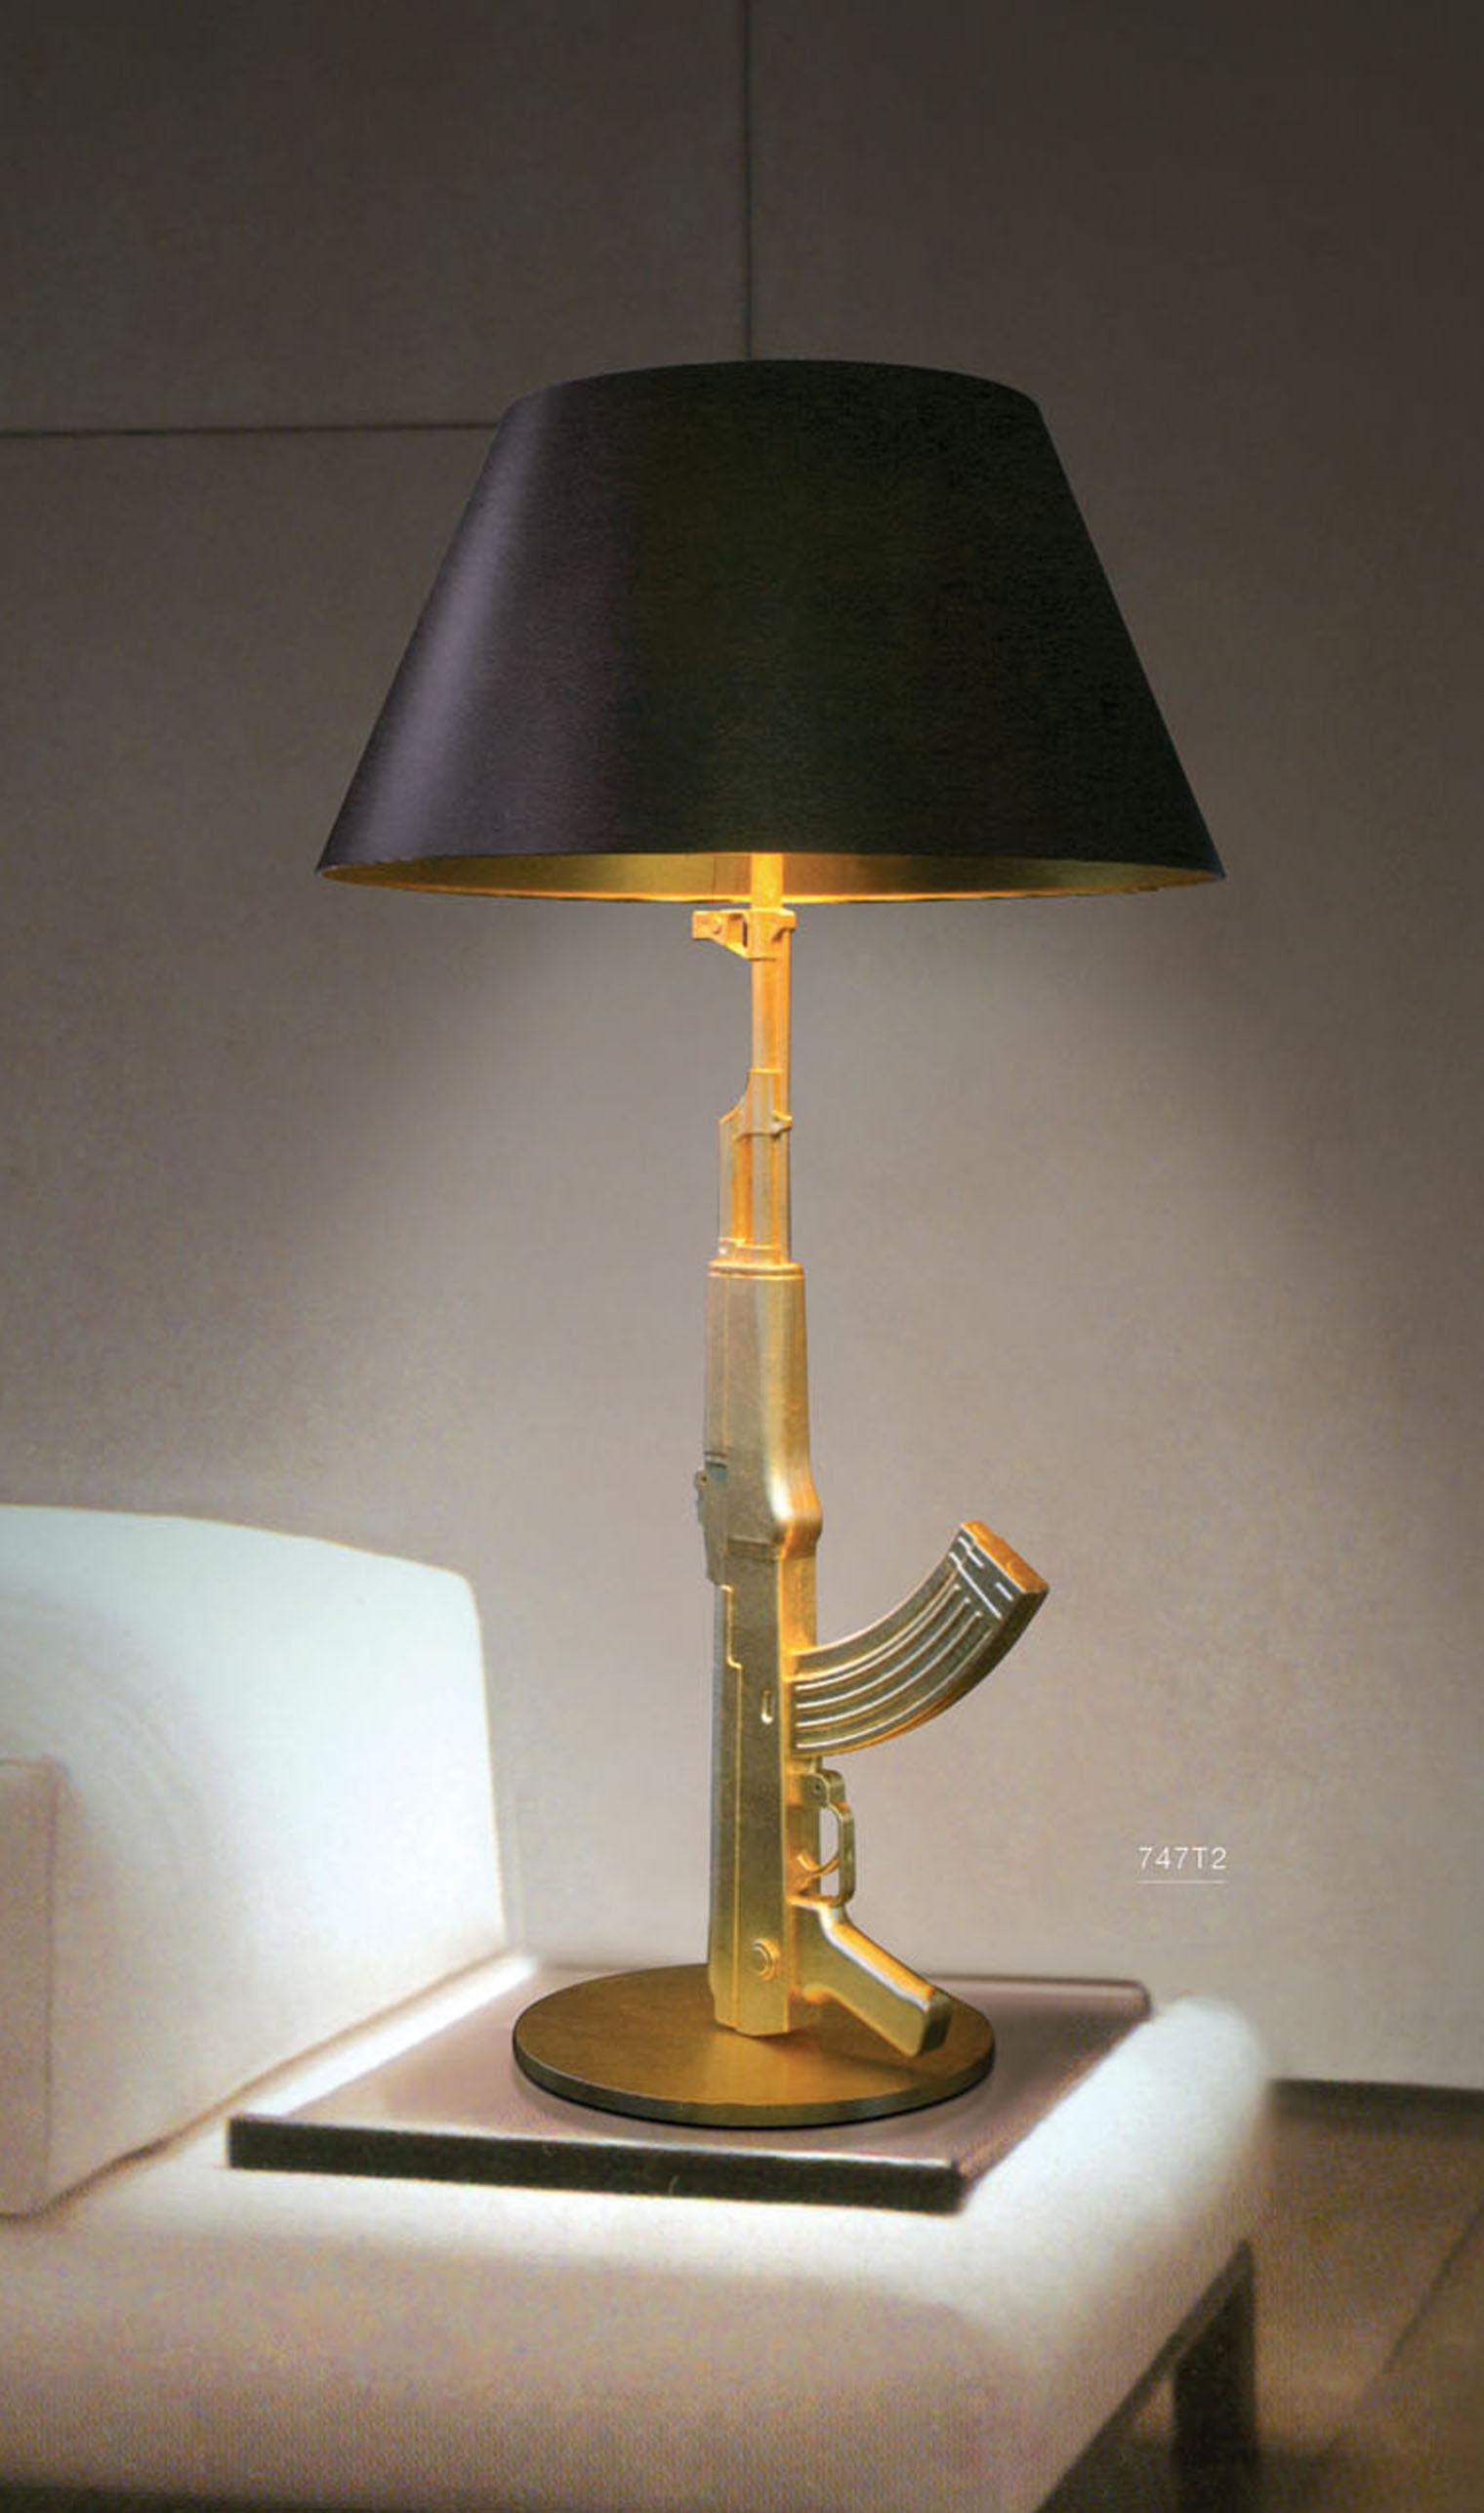 lighting lamps modern living room lamp fols lamp personalized ak47